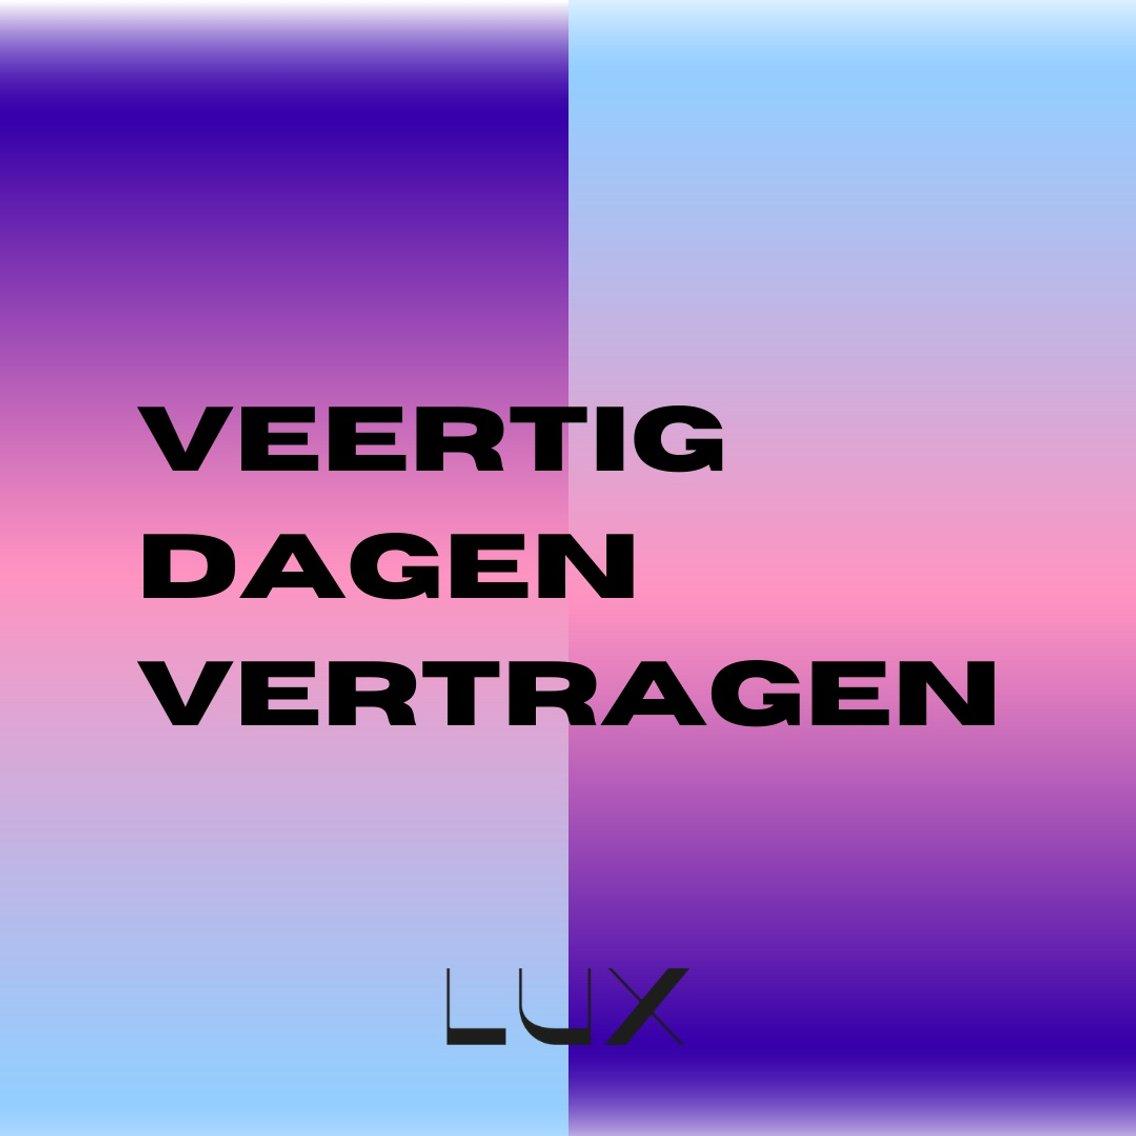 Veertig Dagen Vertragen - immagine di copertina